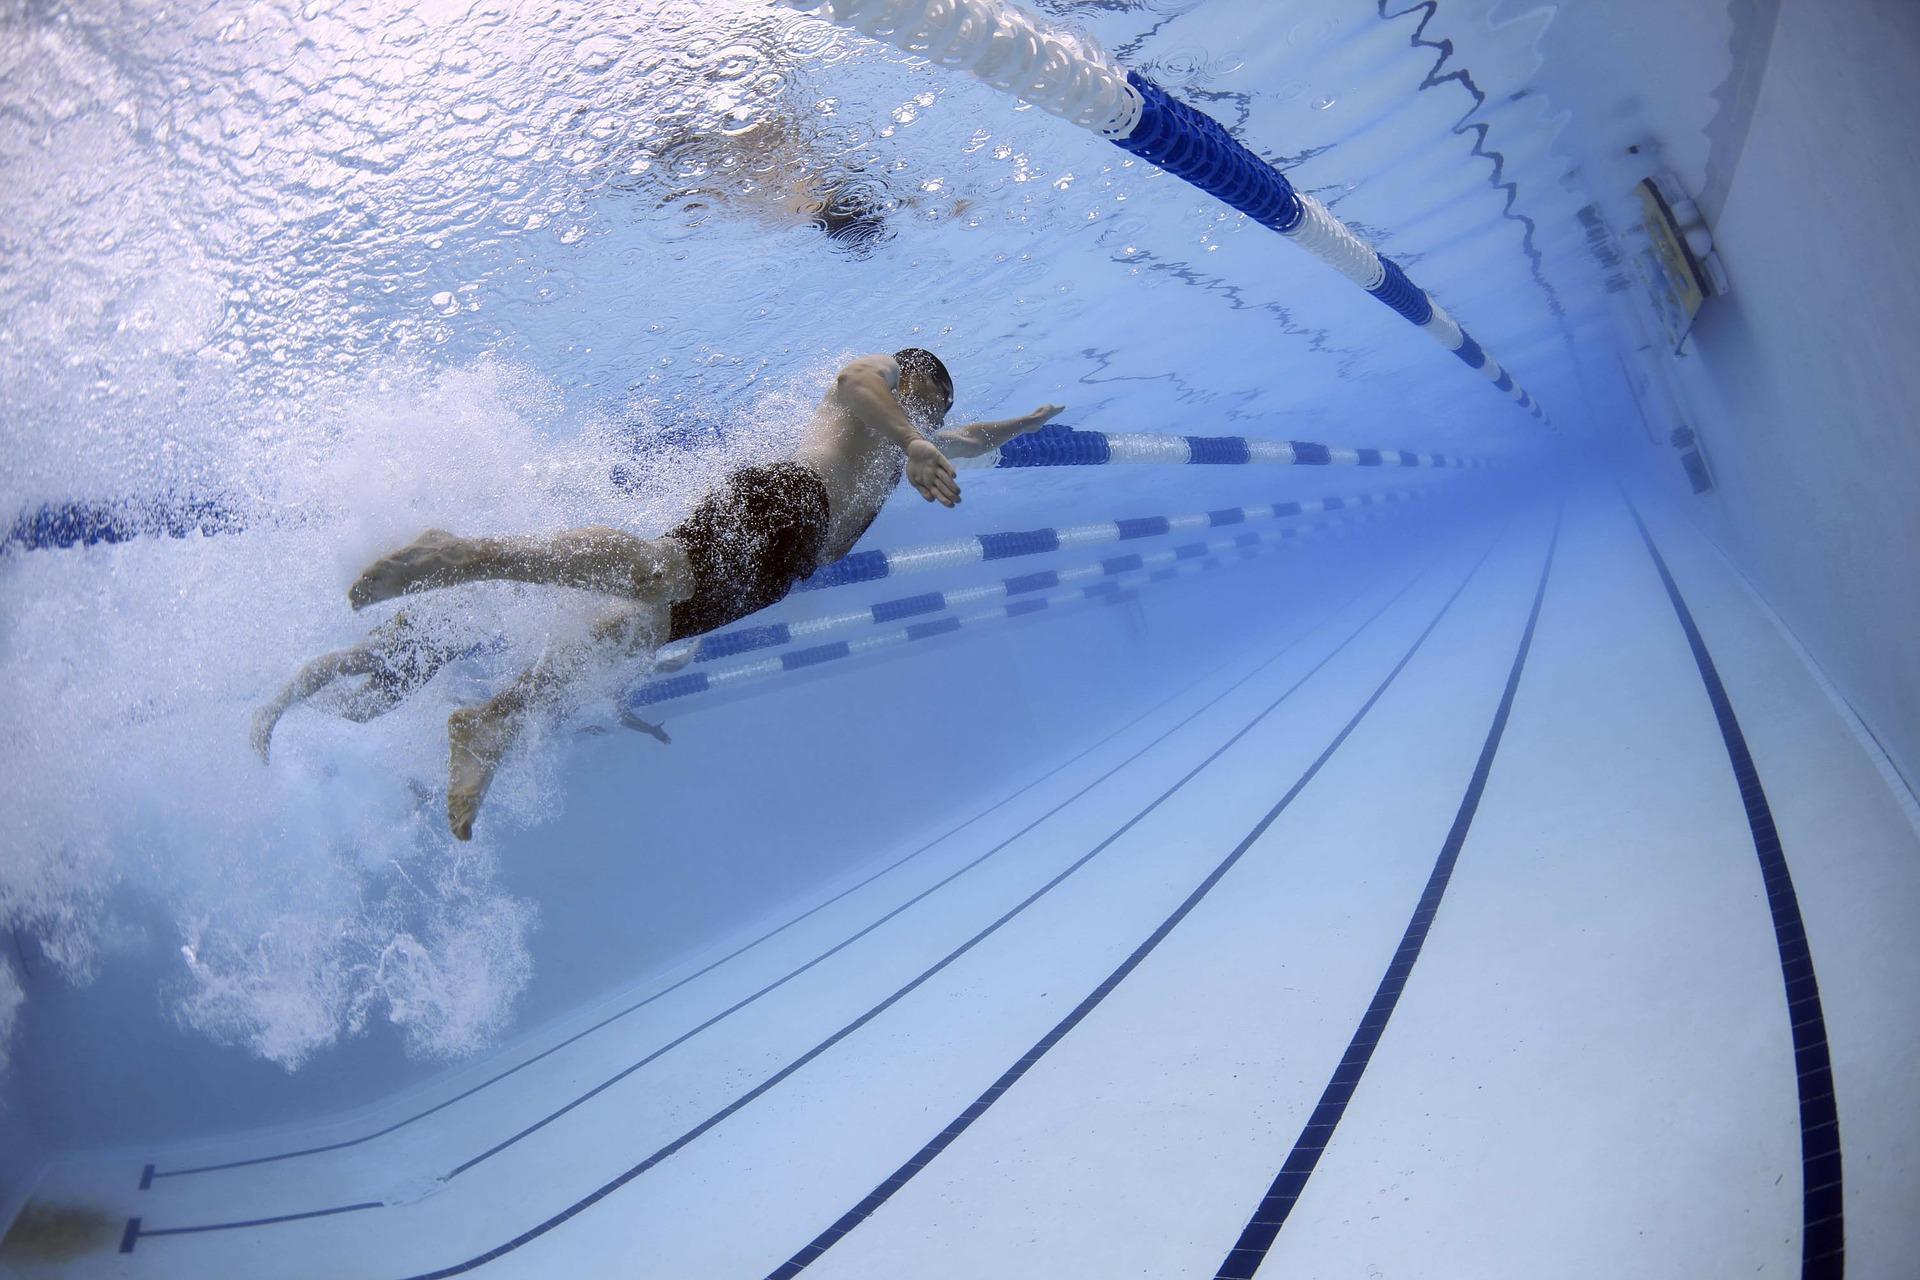 पूल, तैराकी, प्रतियोगिता, तैराक, एथलीटों, ओलंपिक स्विमिंग पूल - HD वॉलपेपर - प्रोफेसर-falken.com